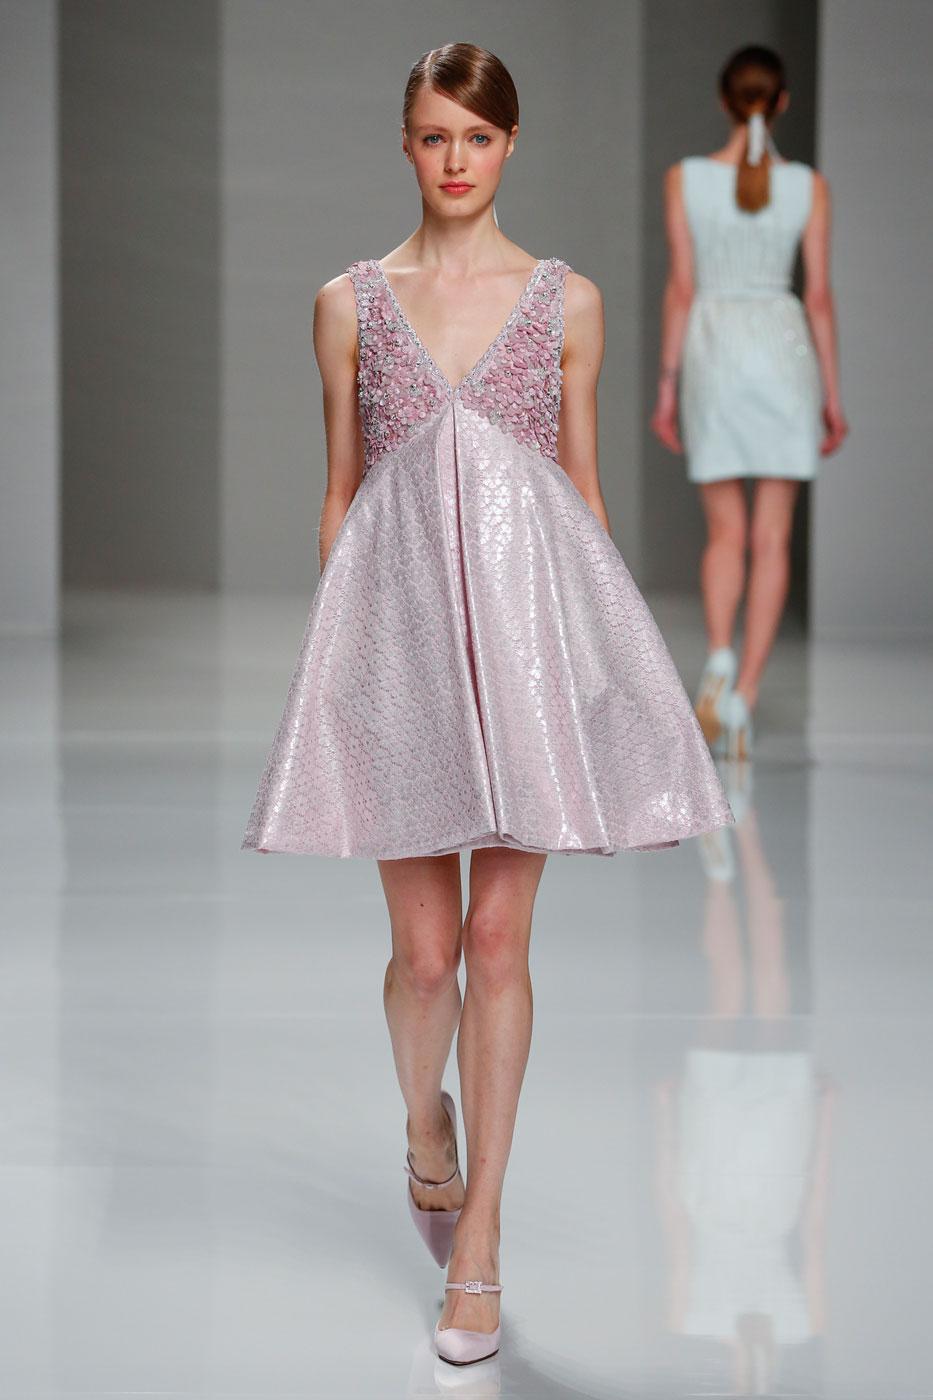 Georges-Hobeika-fashion-runway-show-haute-couture-paris-spring-2015-the-impression-09